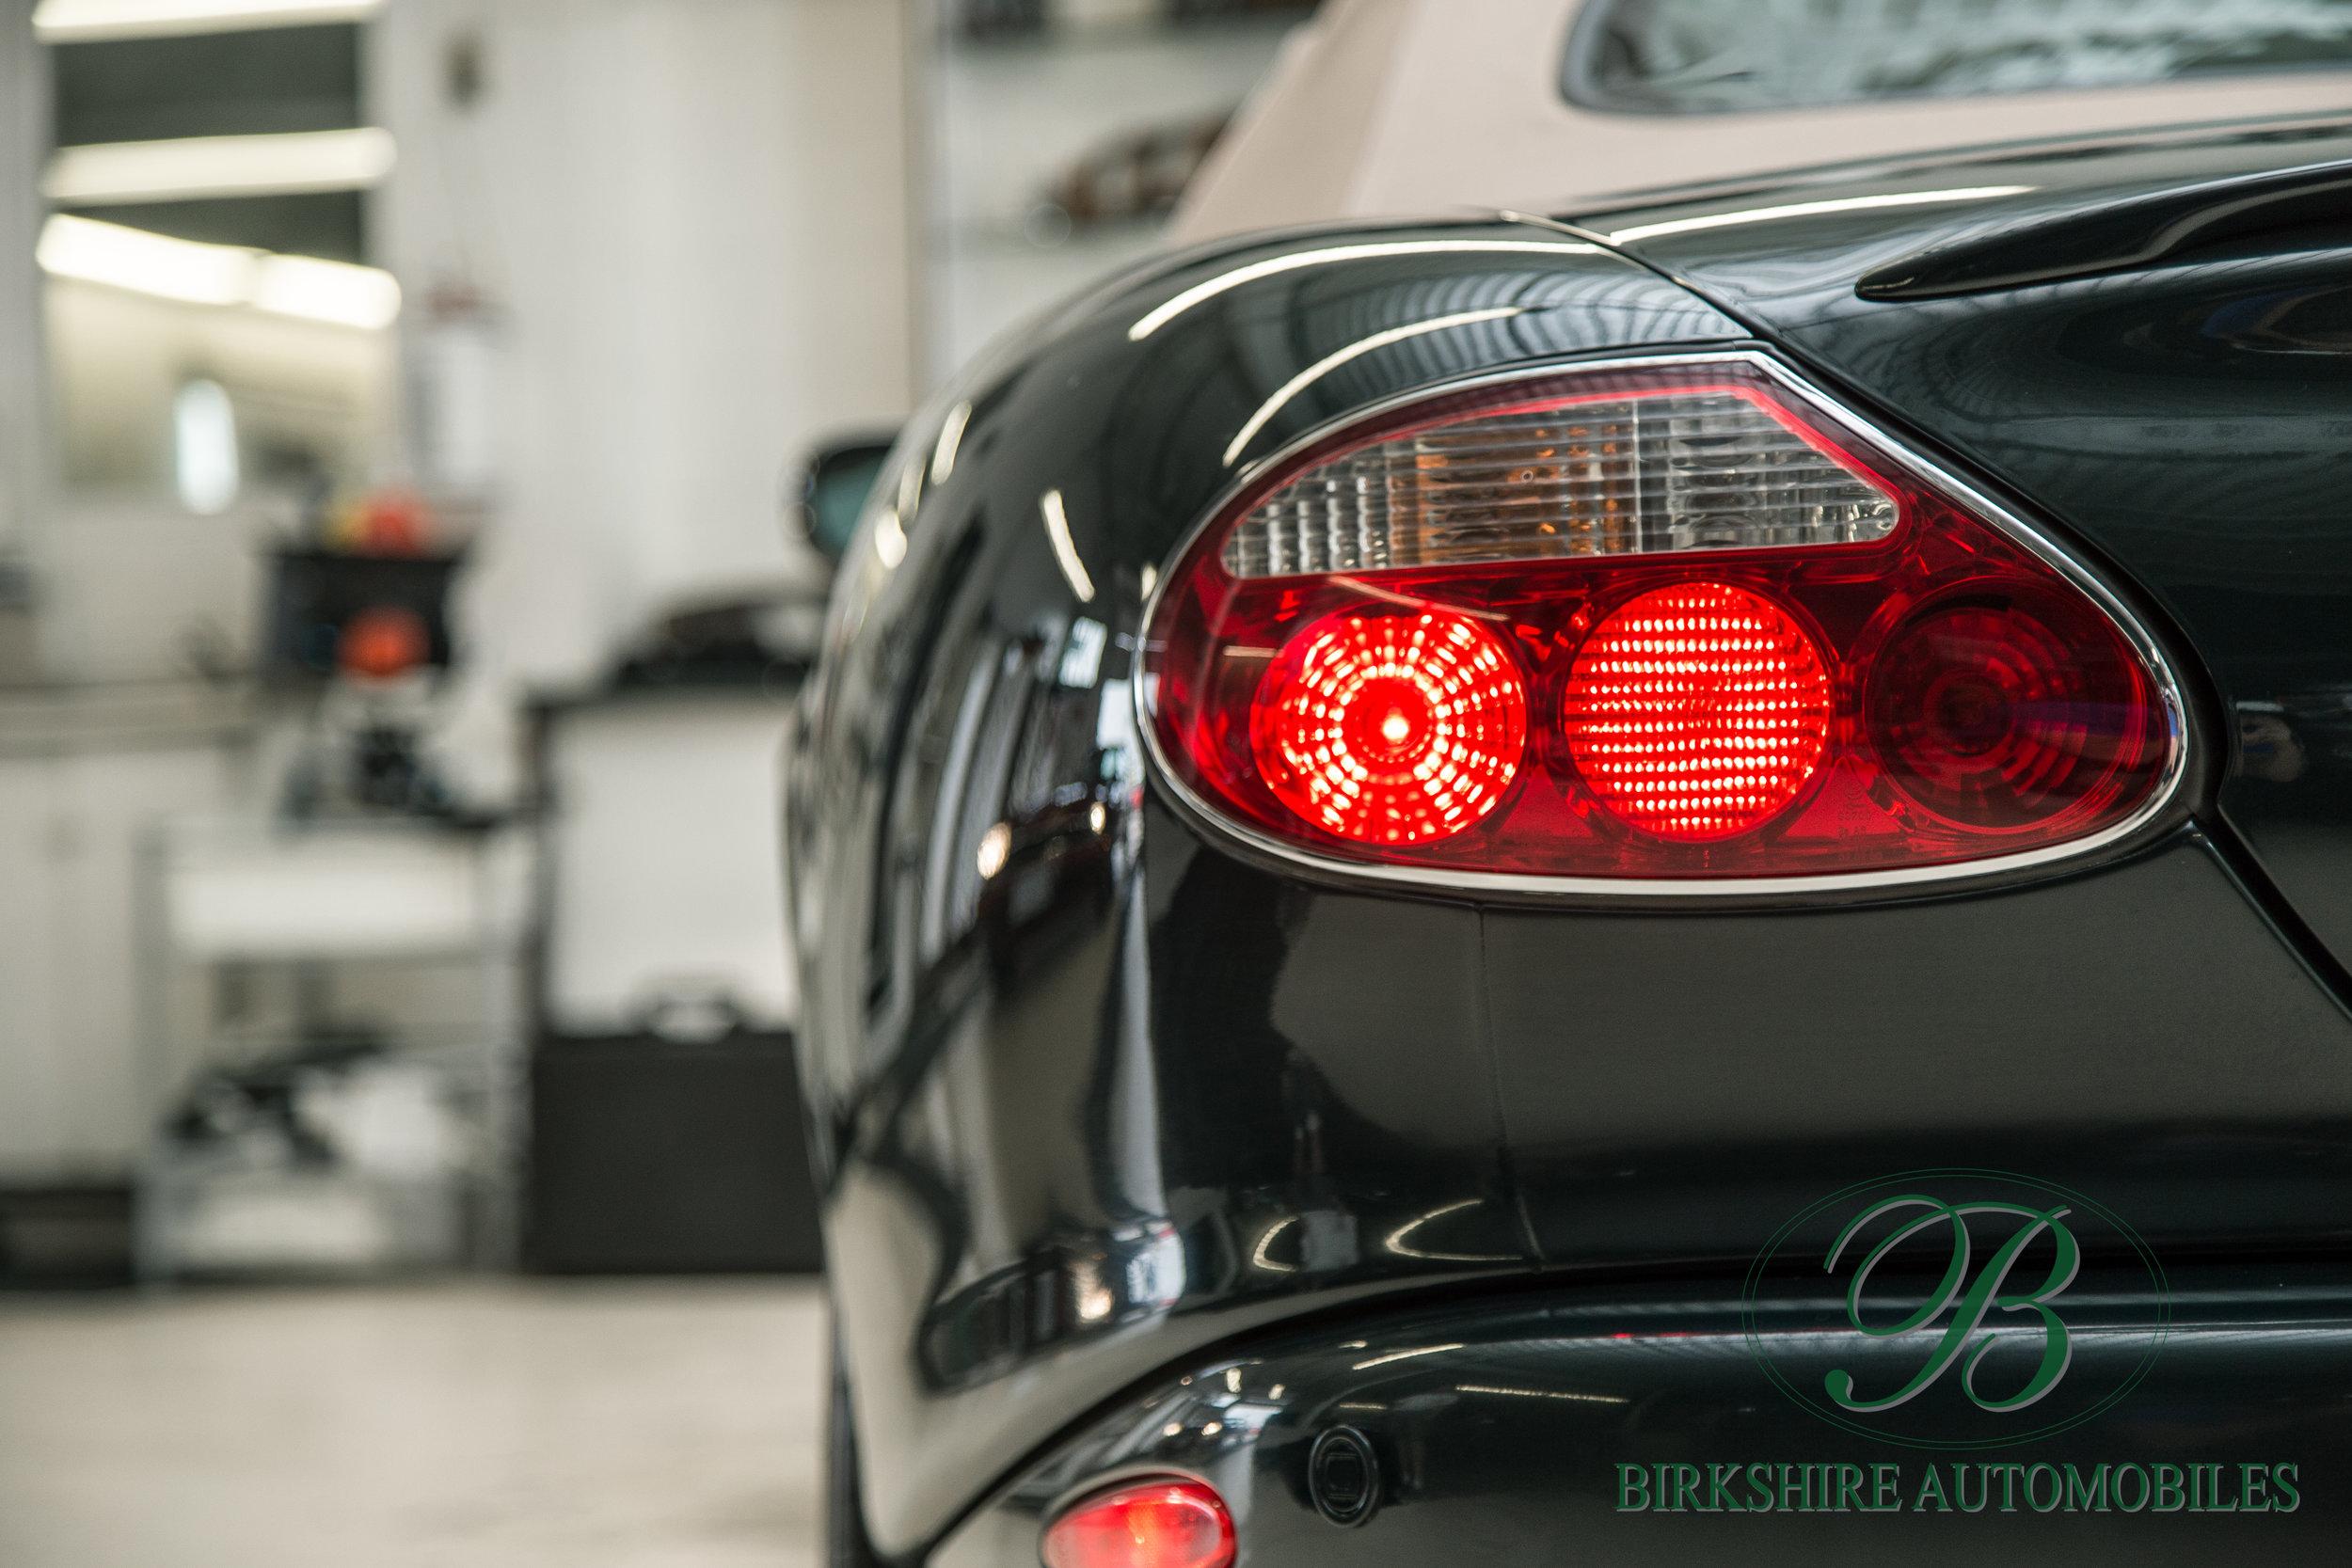 Birkshire Automobiles-110.jpg